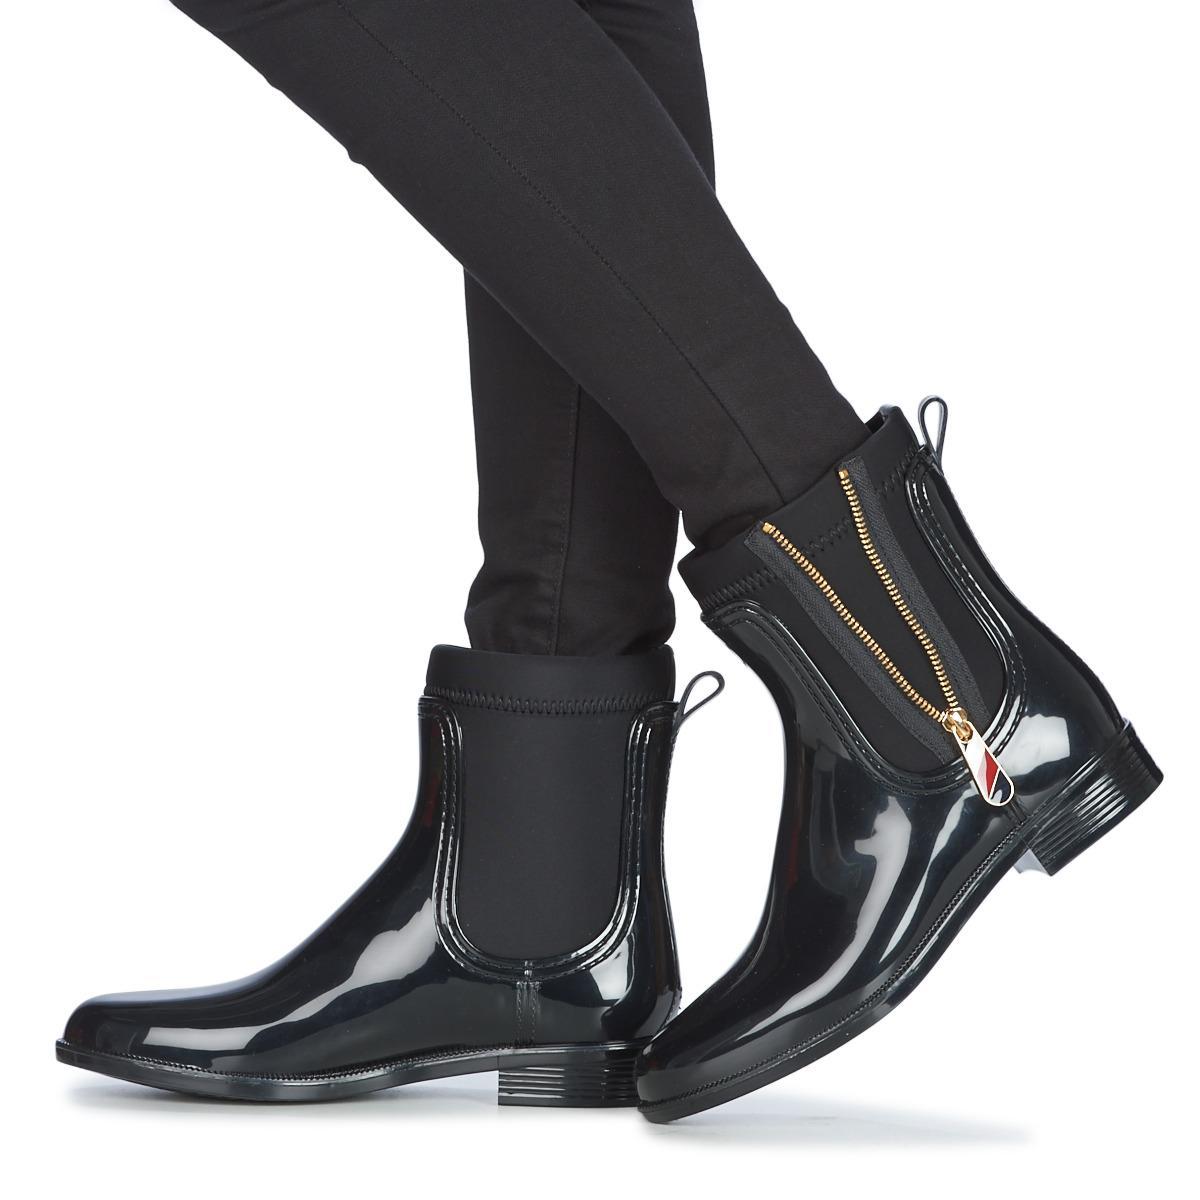 04fdbe4ef668 Tommy Hilfiger - Black Material Mix Rain Boot Wellington Boots - Lyst. View  fullscreen